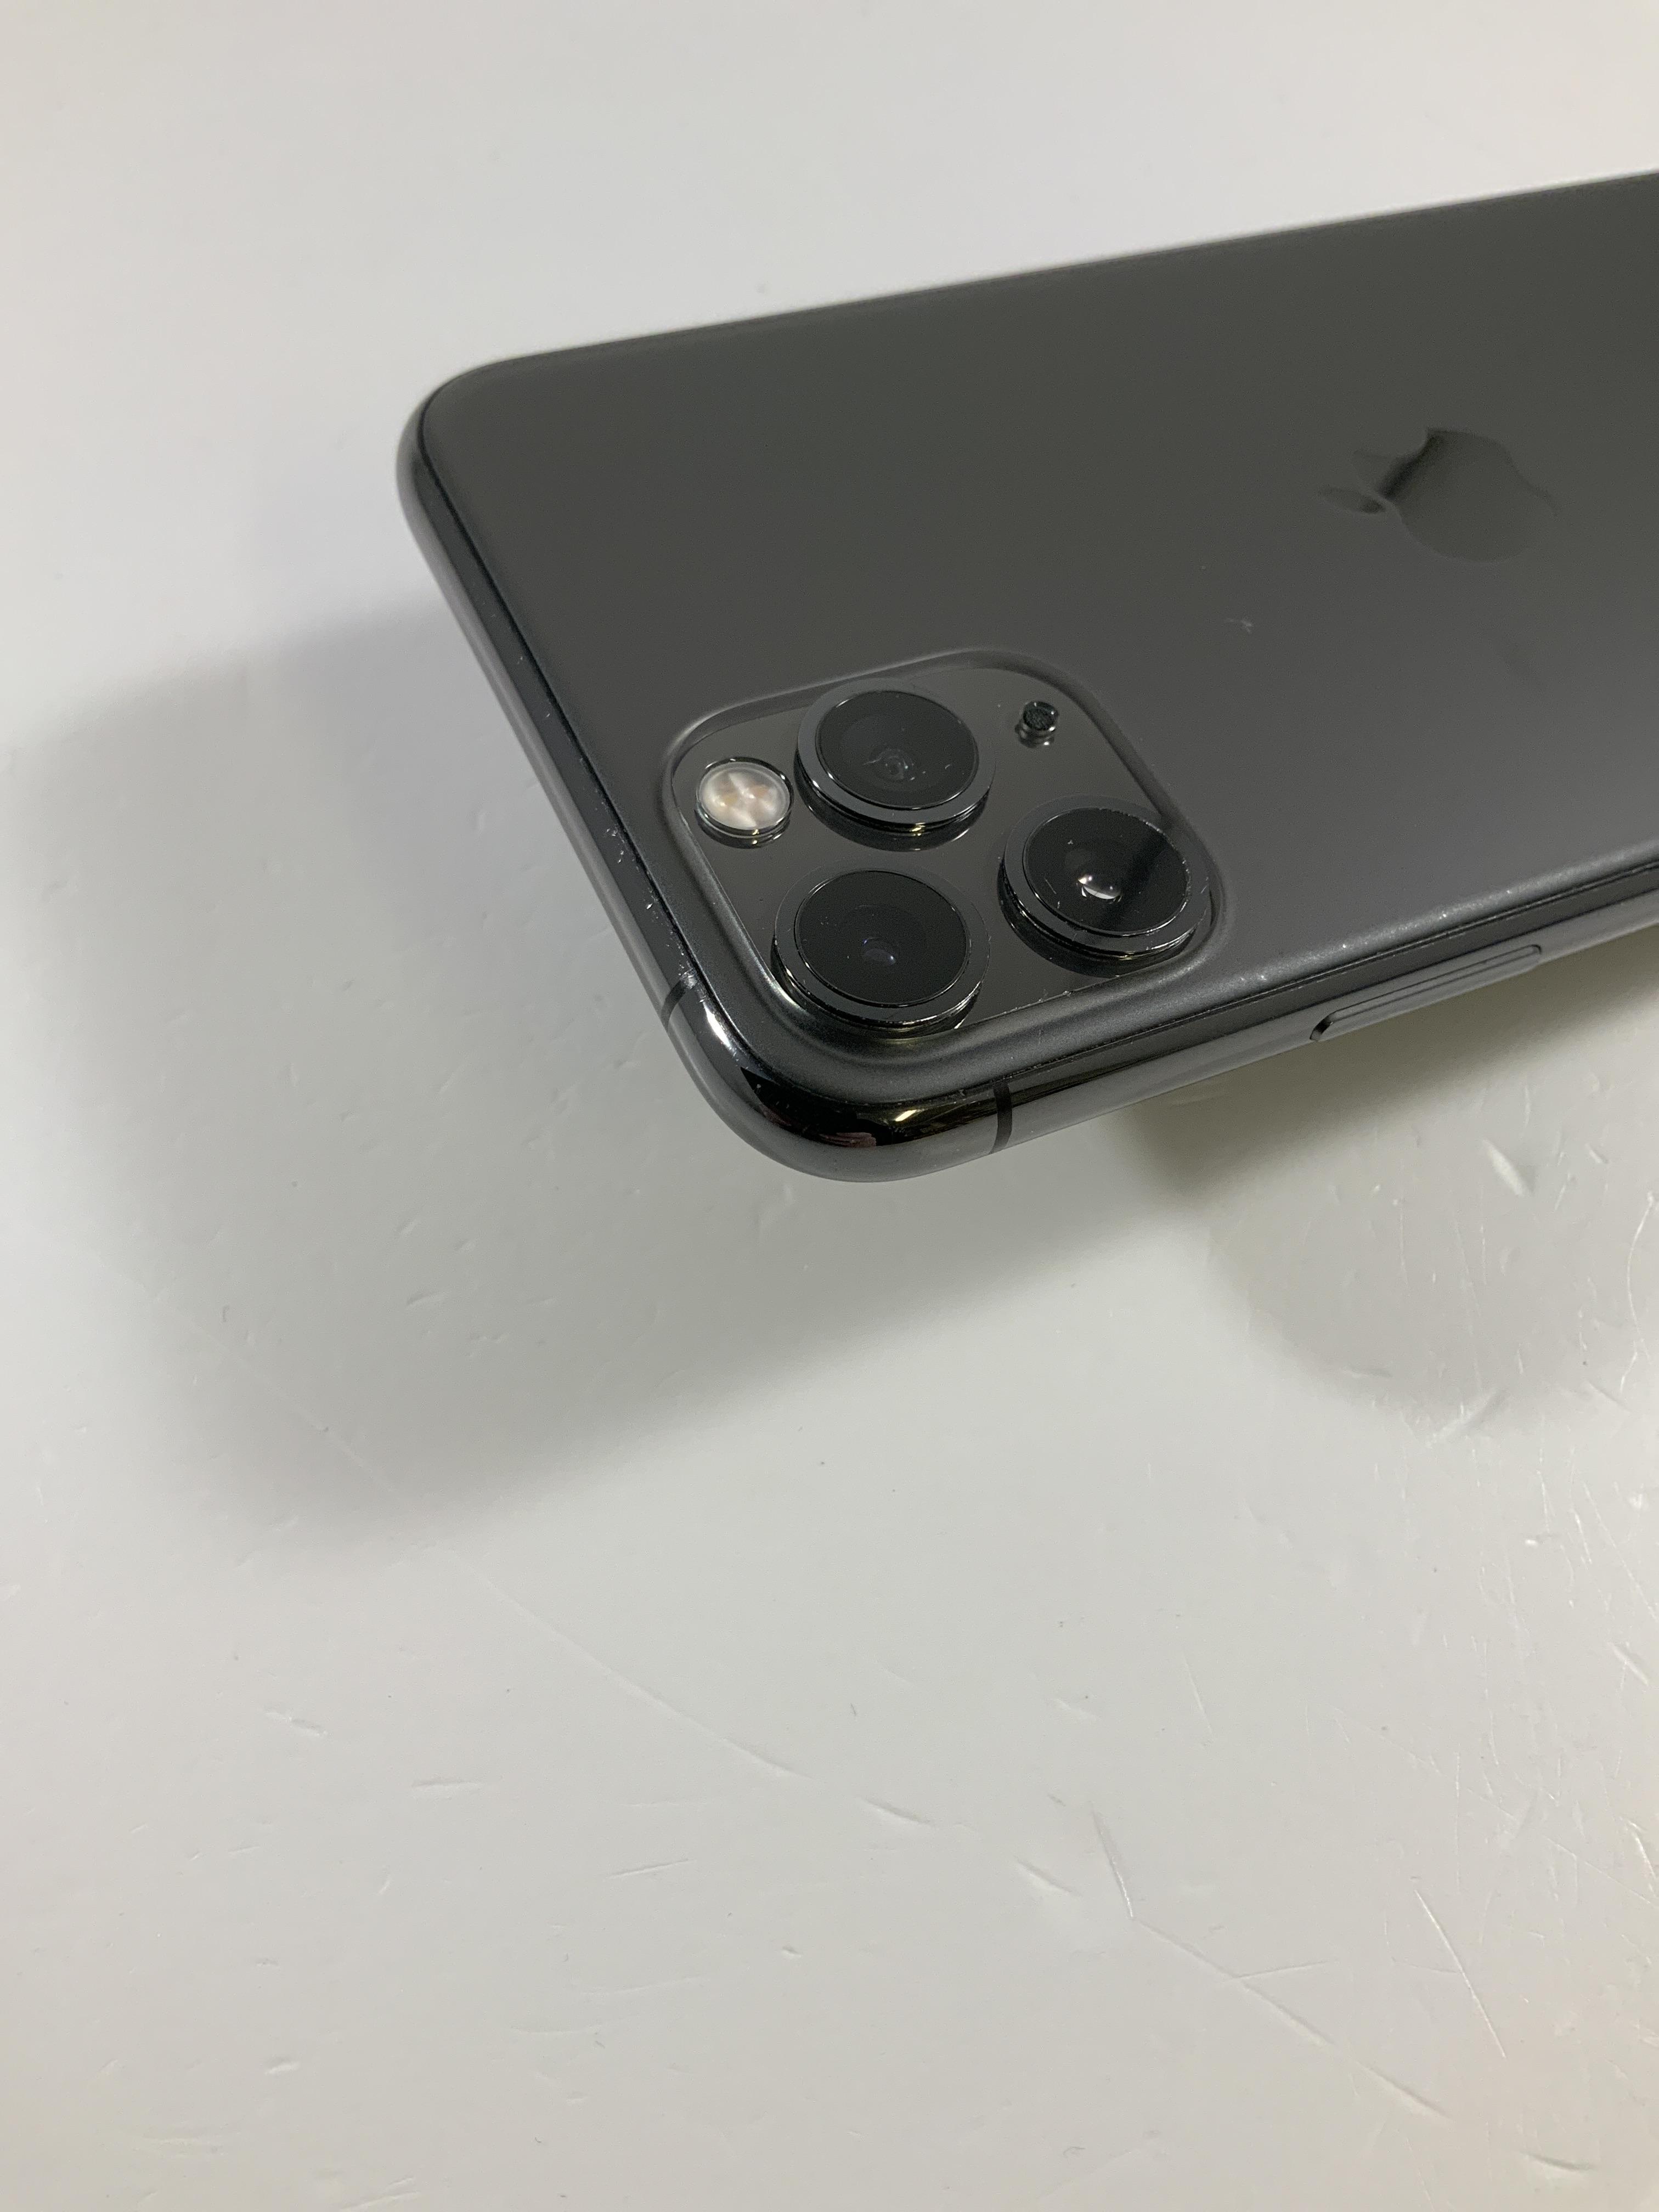 iPhone 11 Pro 64GB, 64GB, Space Gray, image 3